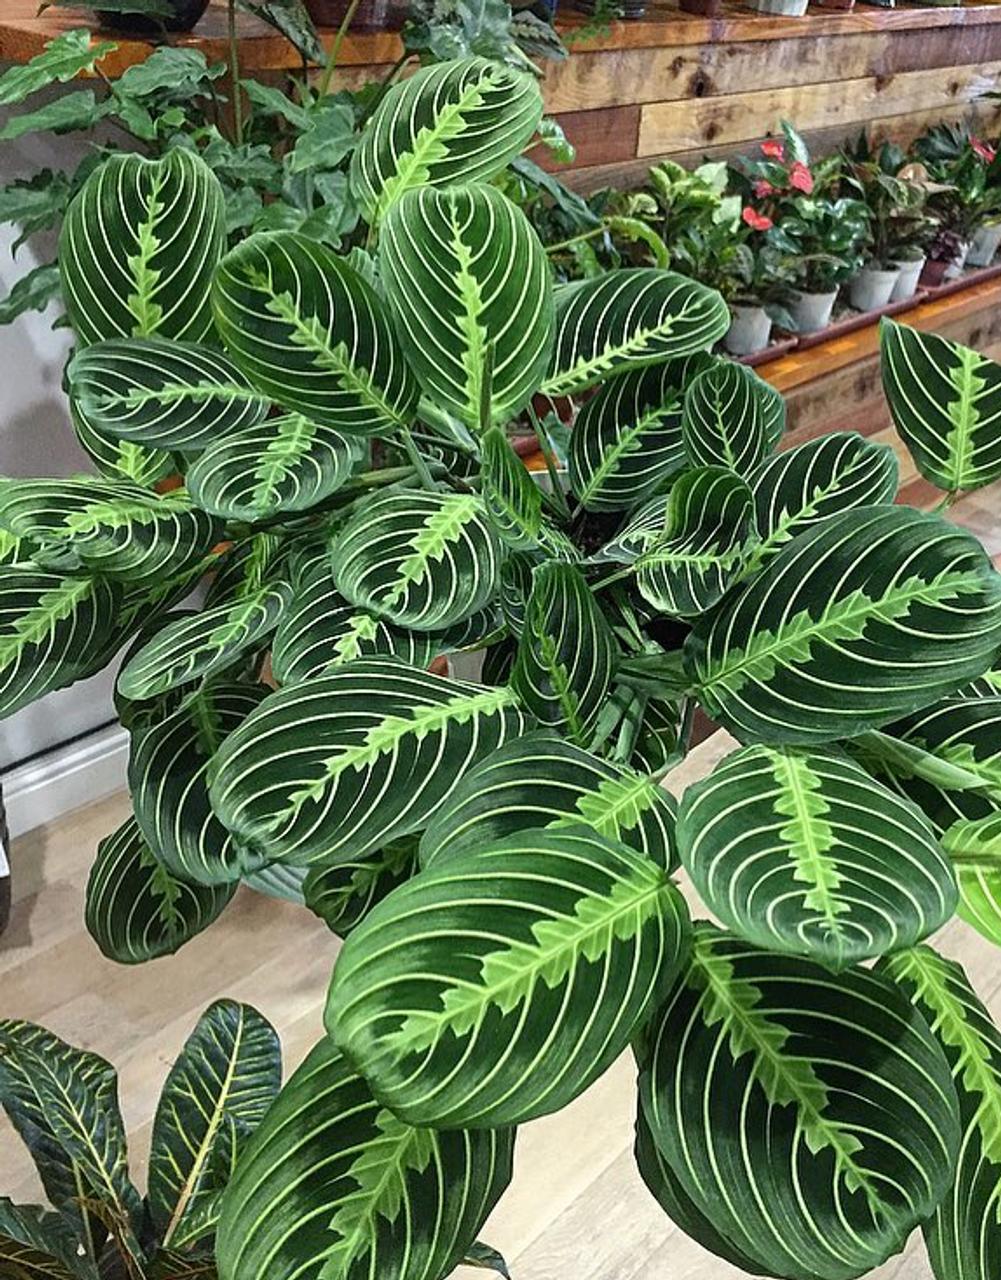 10 Unbelievable Patterned Variegated Indoor Plants - Prayer Plant